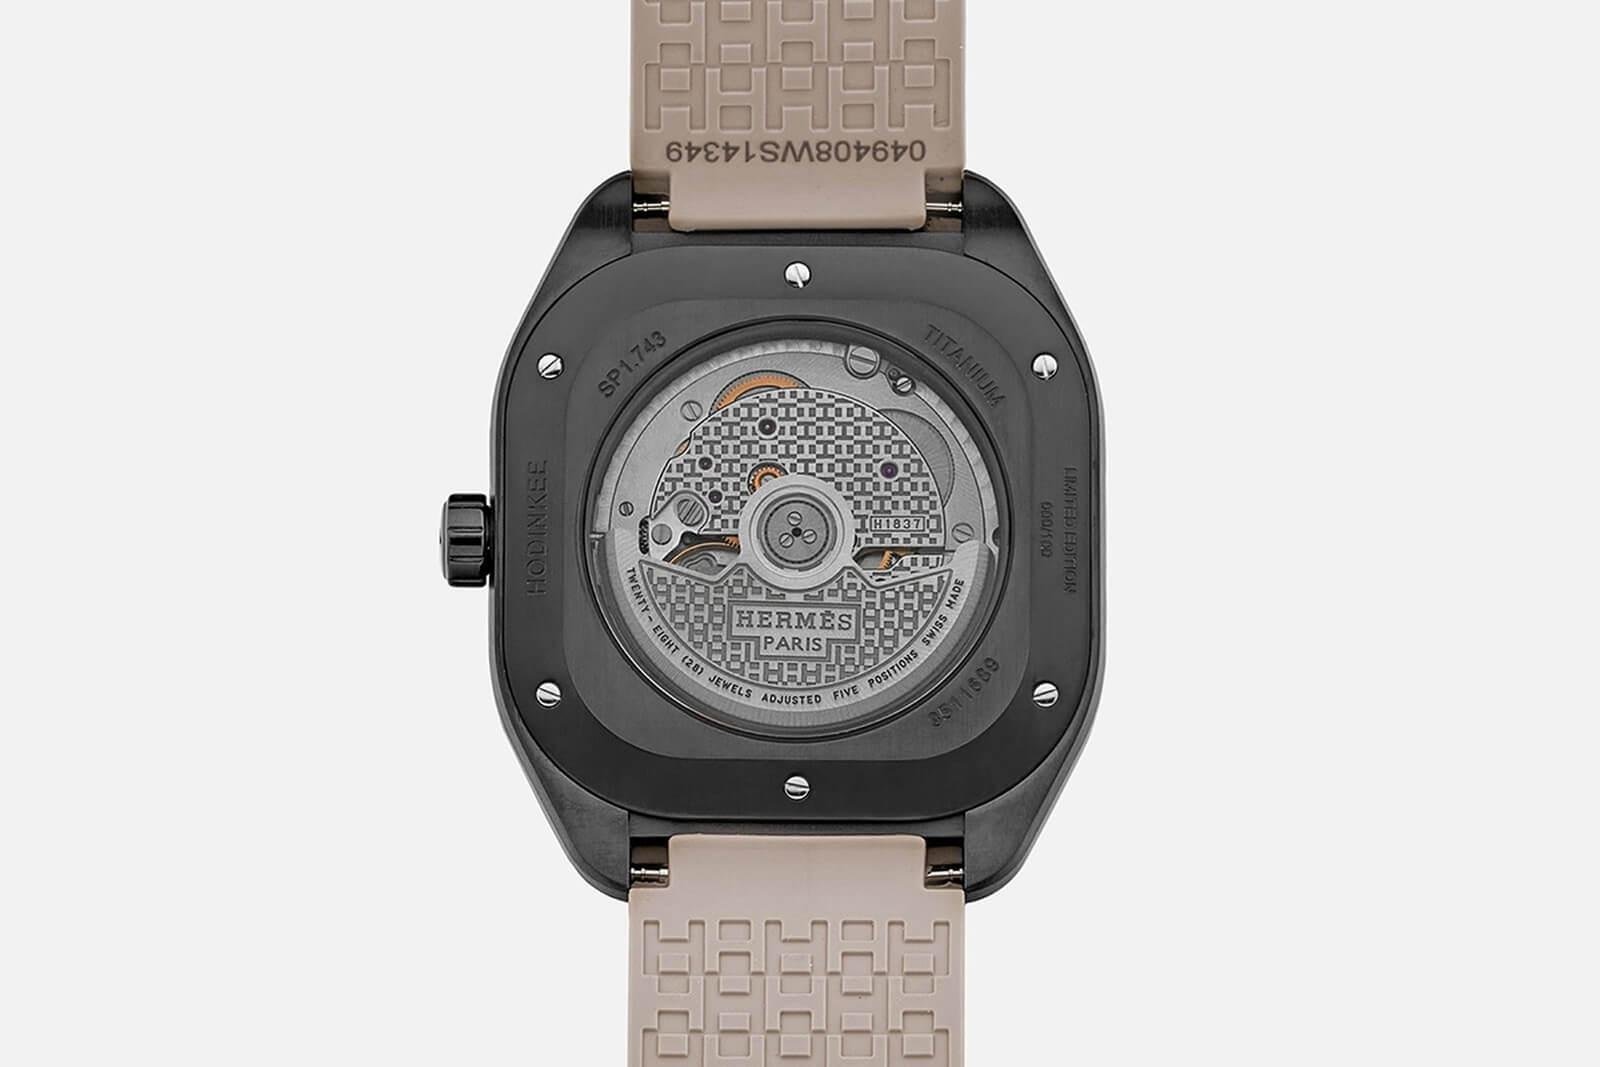 hermes h08 hodinkee watch 2